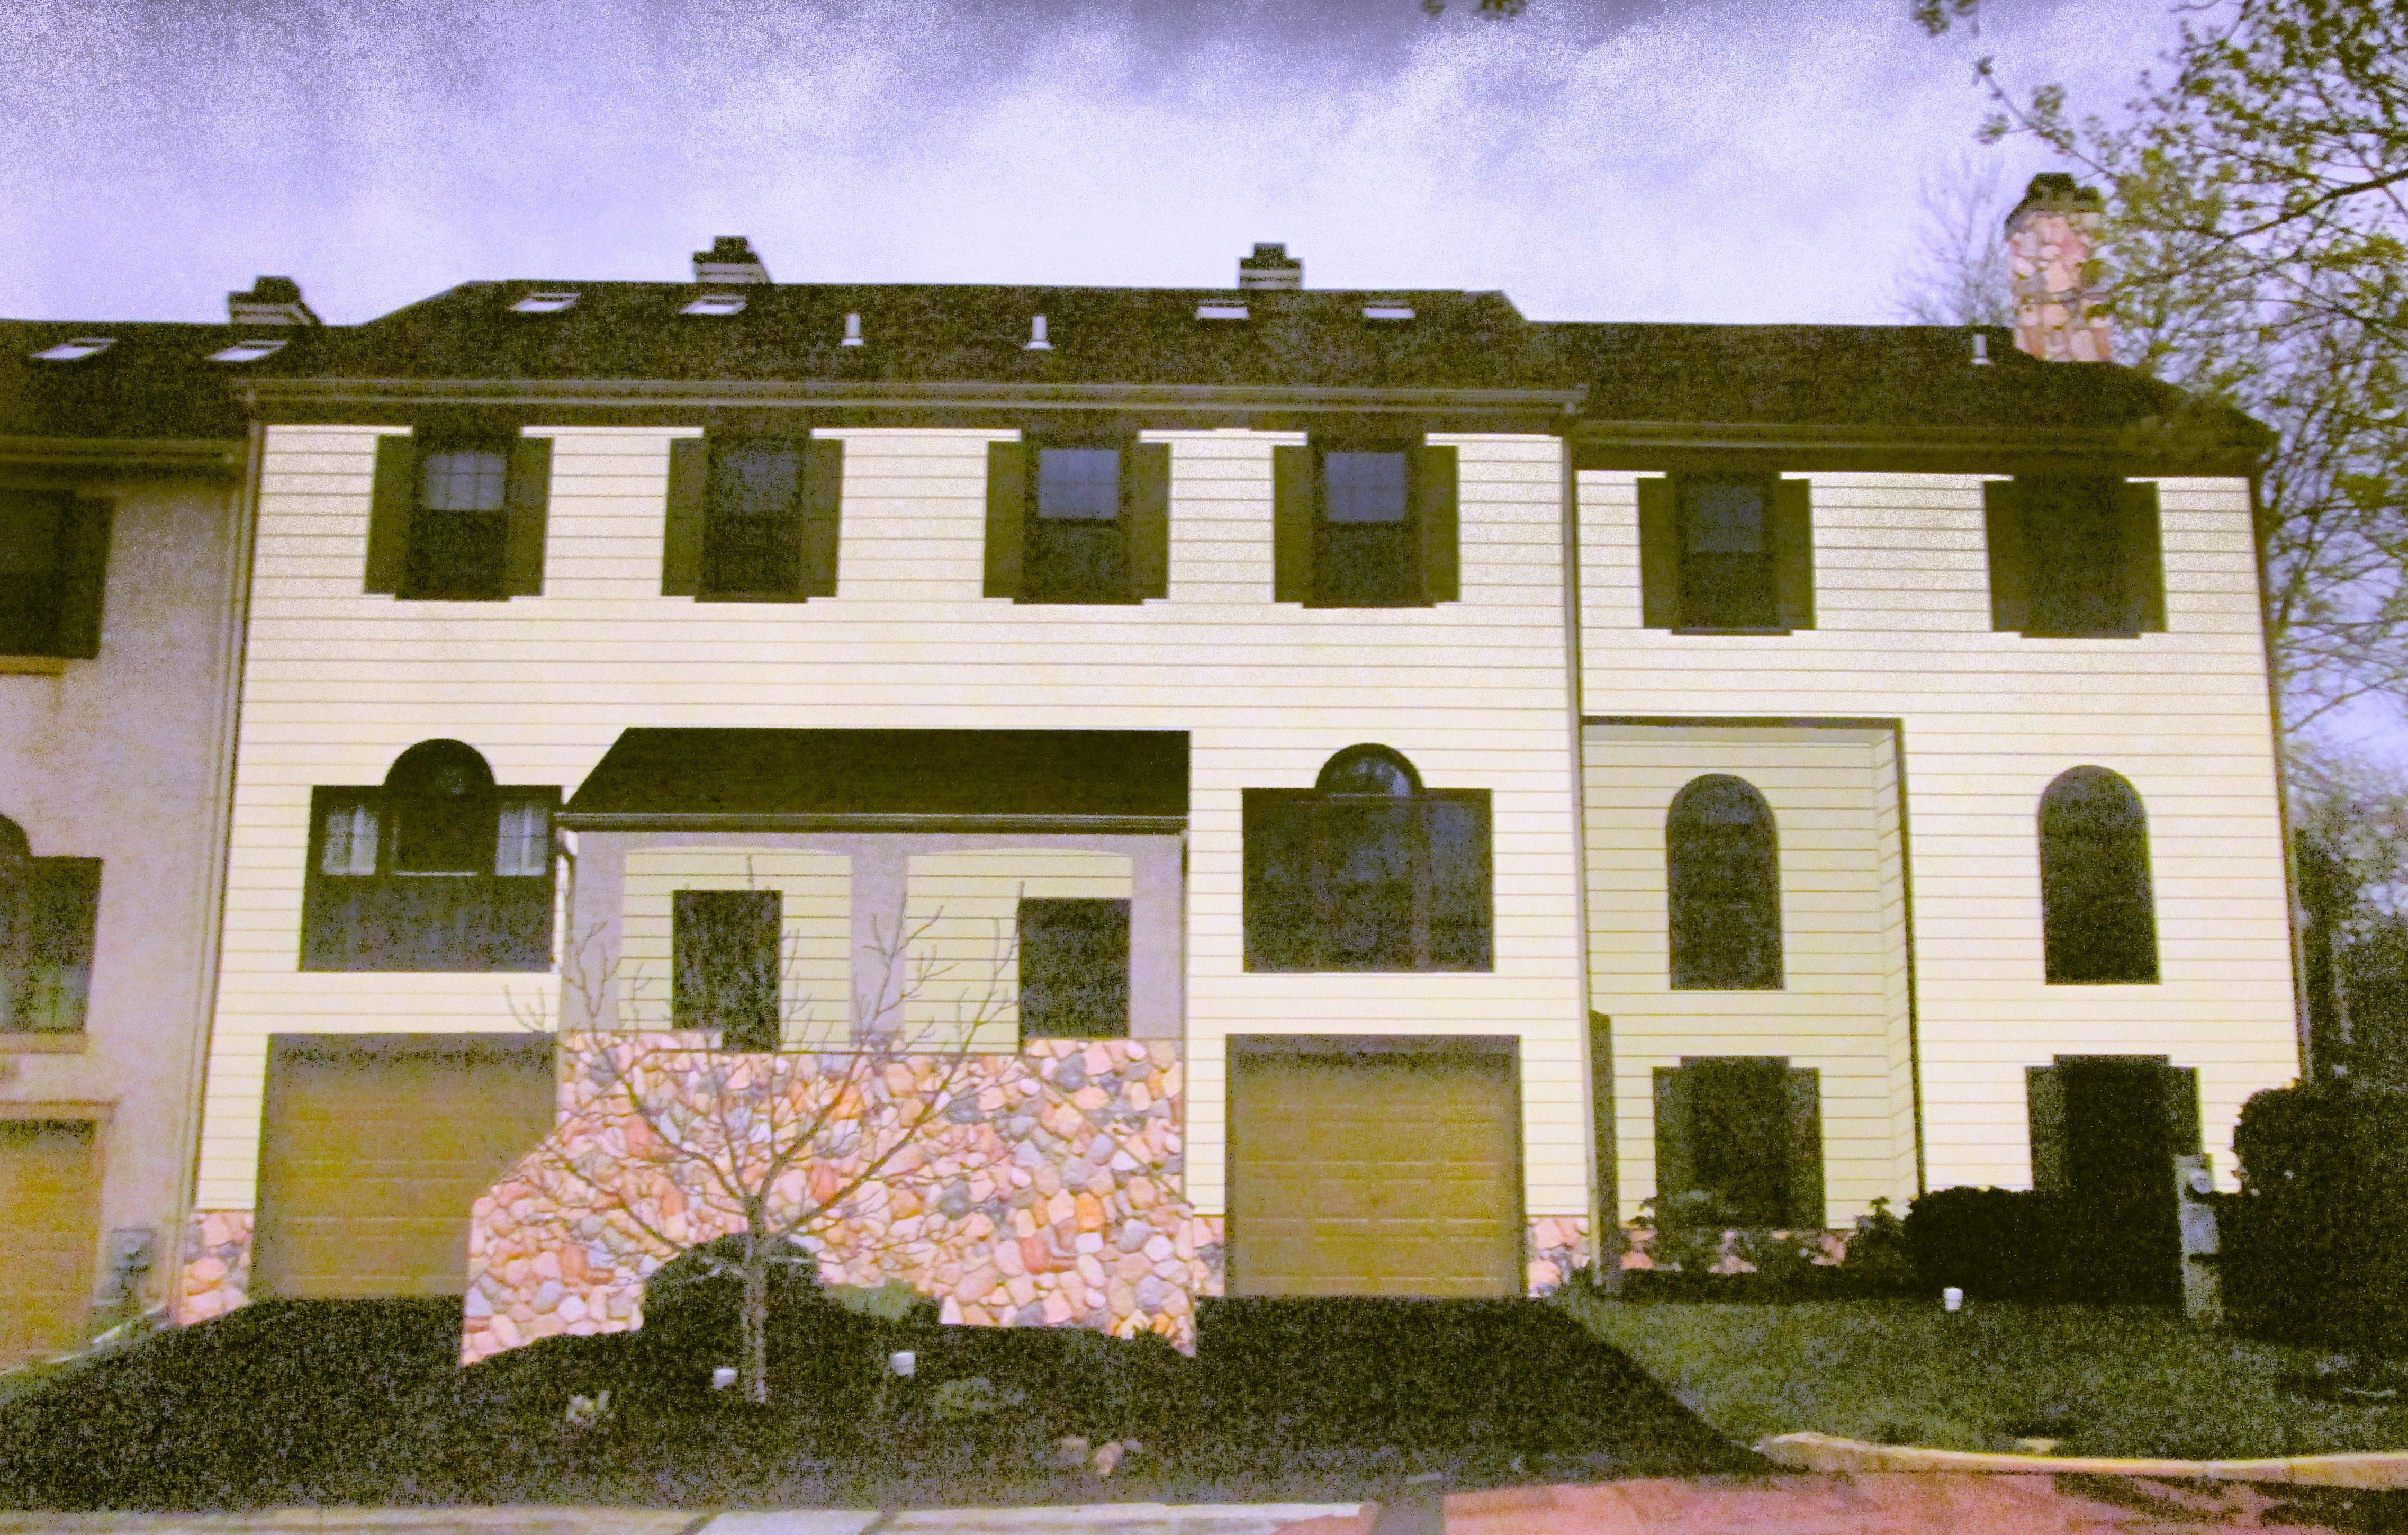 Dartmouth Village   25 000 Minimum  For  150 000 Work Order Per Building Complex In Cornell